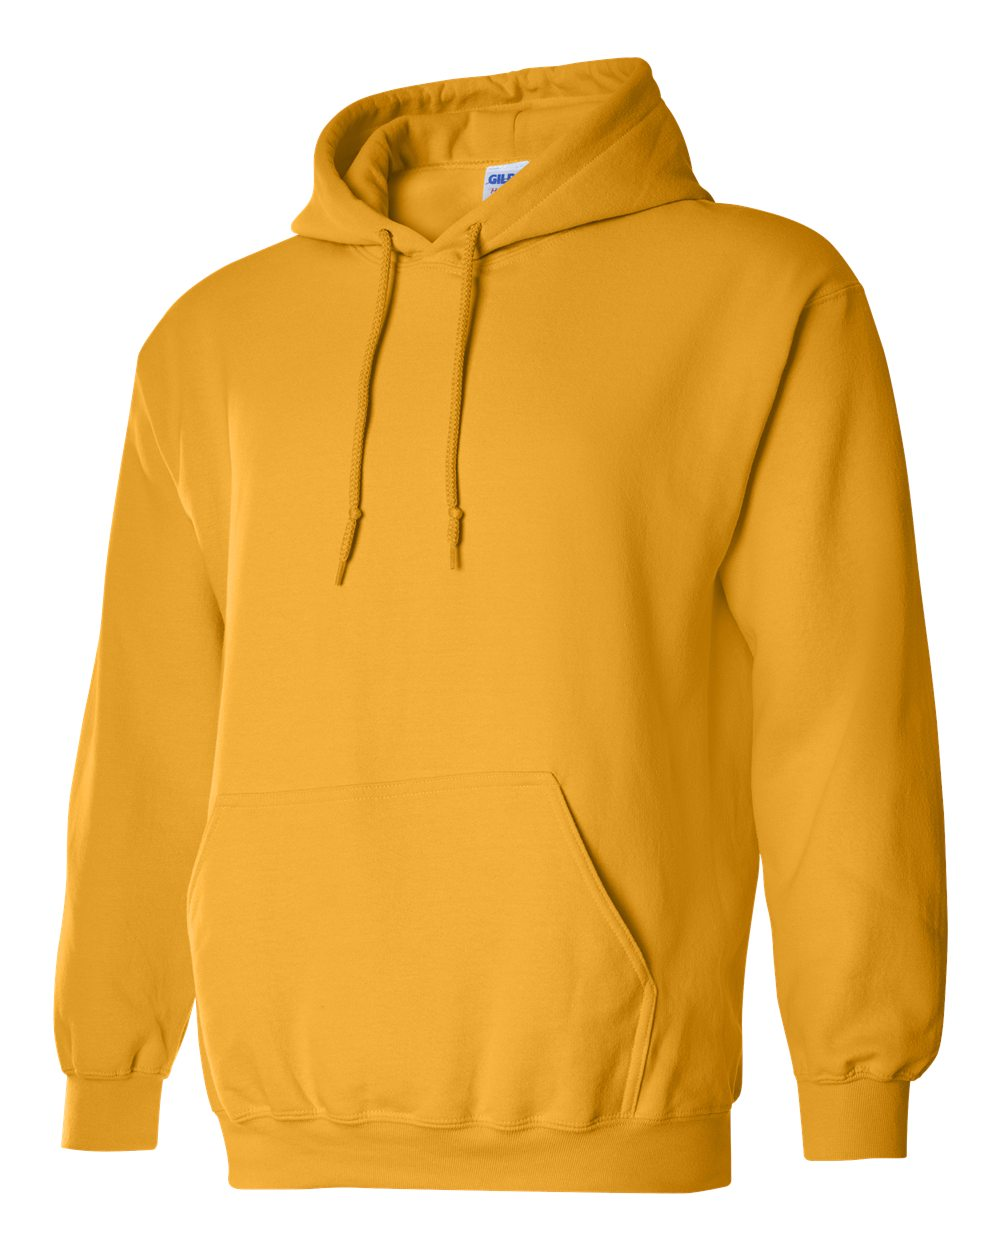 Gildan Heavy Blend Hooded Sweatshirt GI18500 Gold